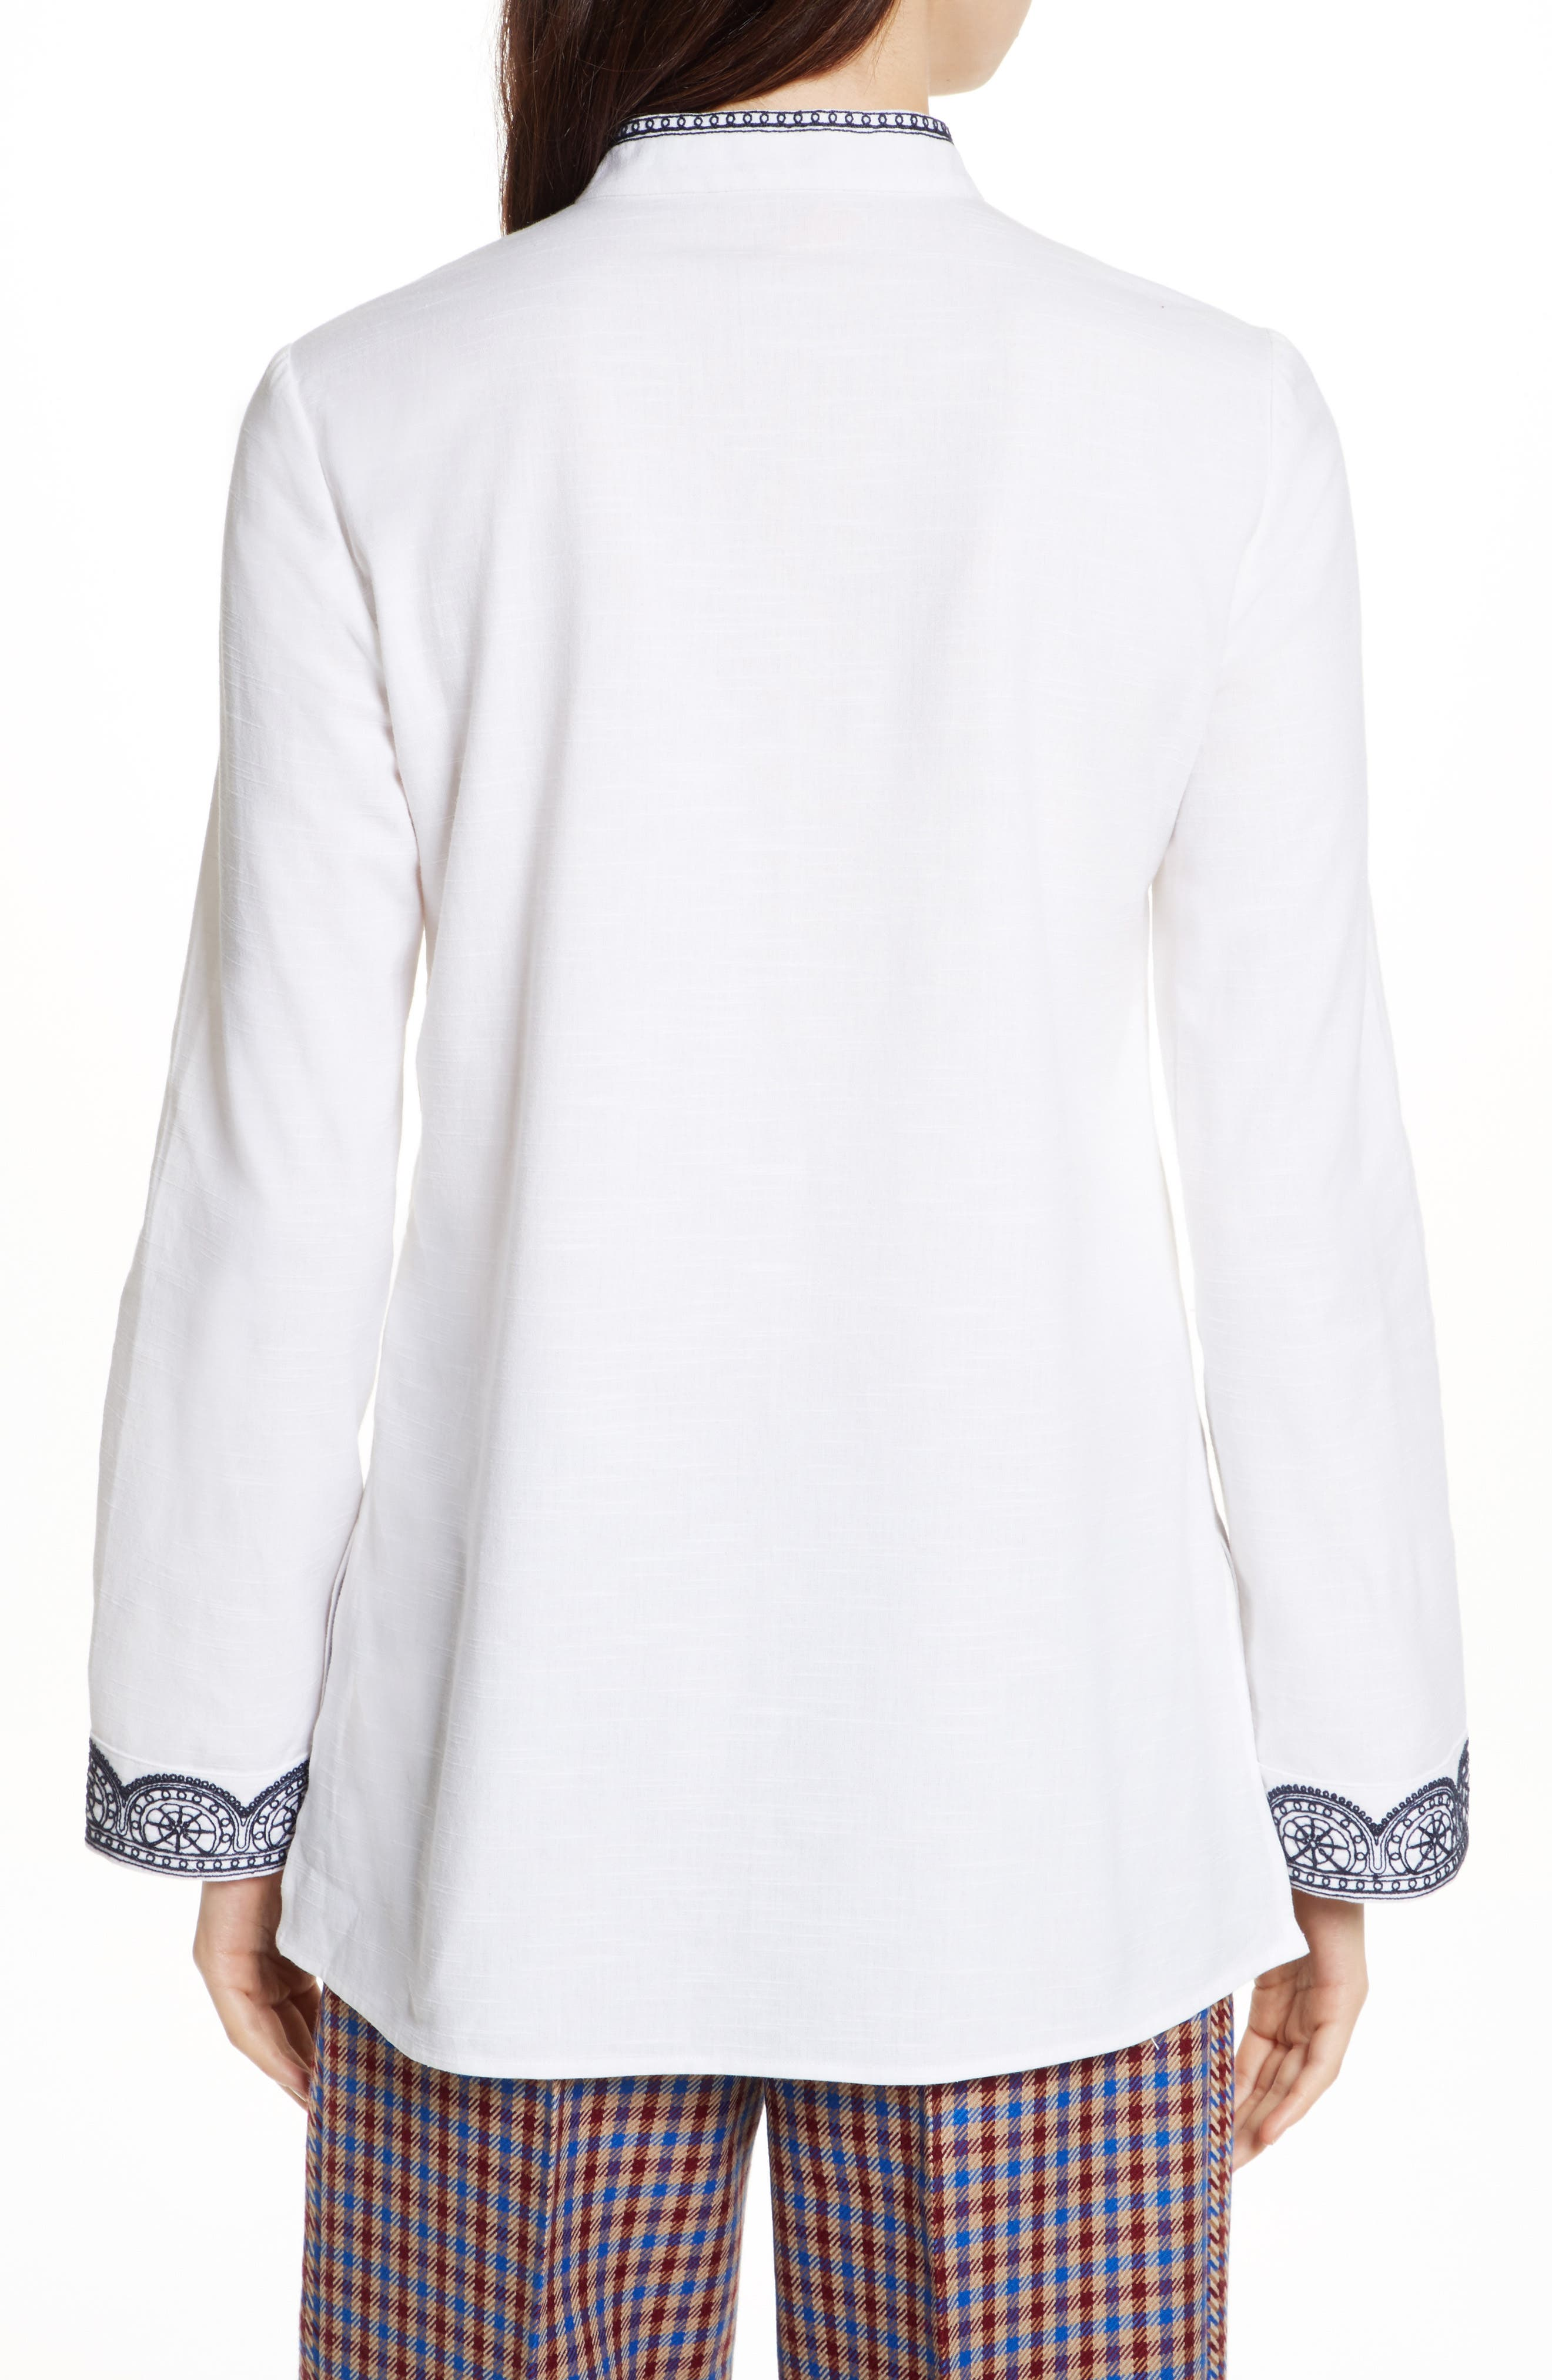 Embellished Tunic,                             Alternate thumbnail 2, color,                             White